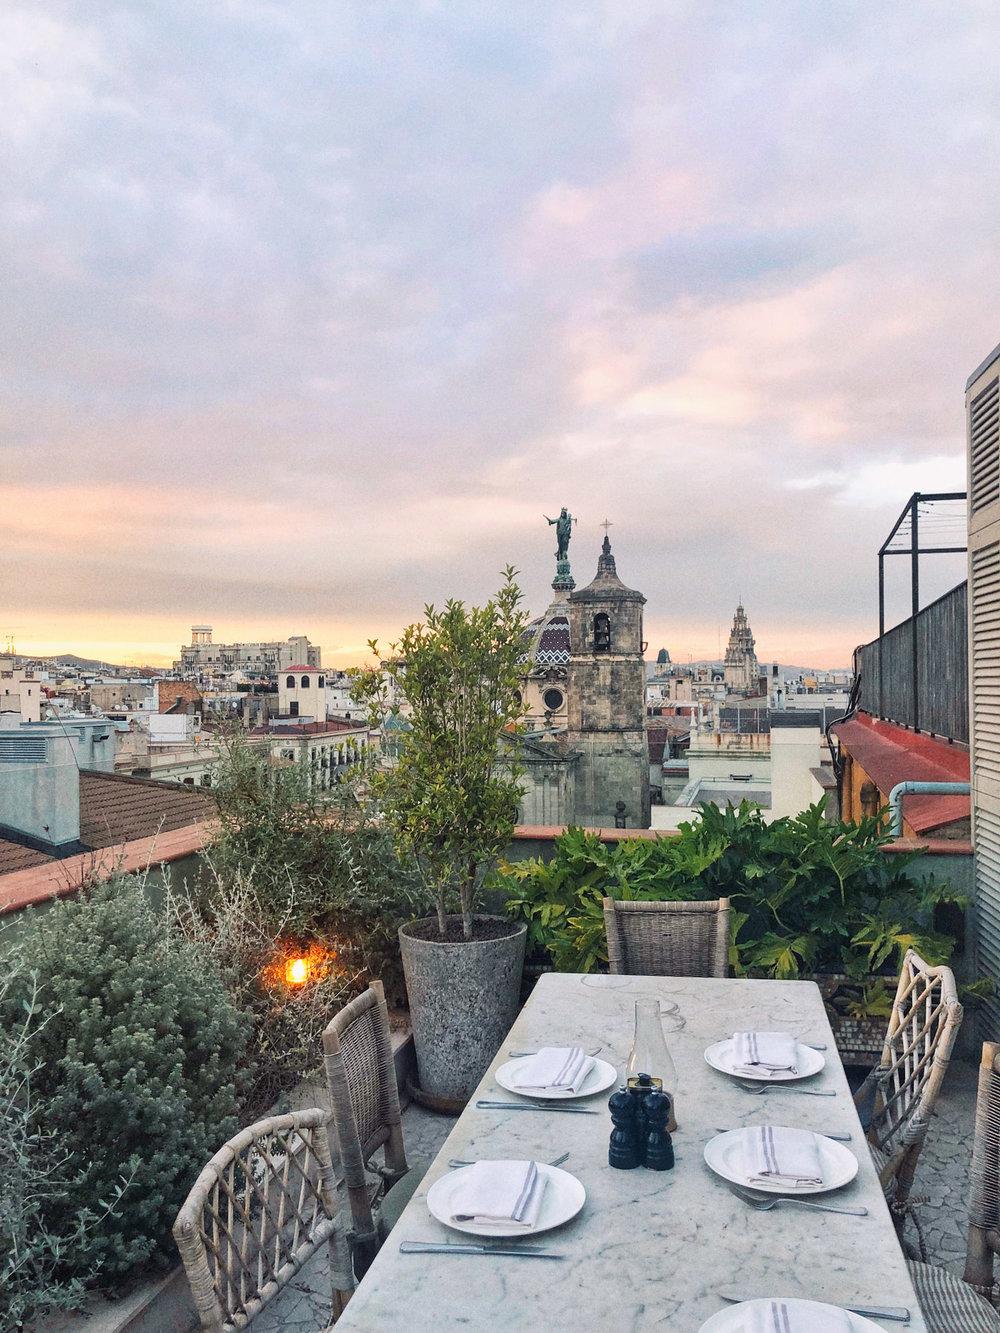 Honeymoon in Europe // Travel Ideas / Wanderlust / Photography / Europe Trip Itinerary / Soho House Barcelona